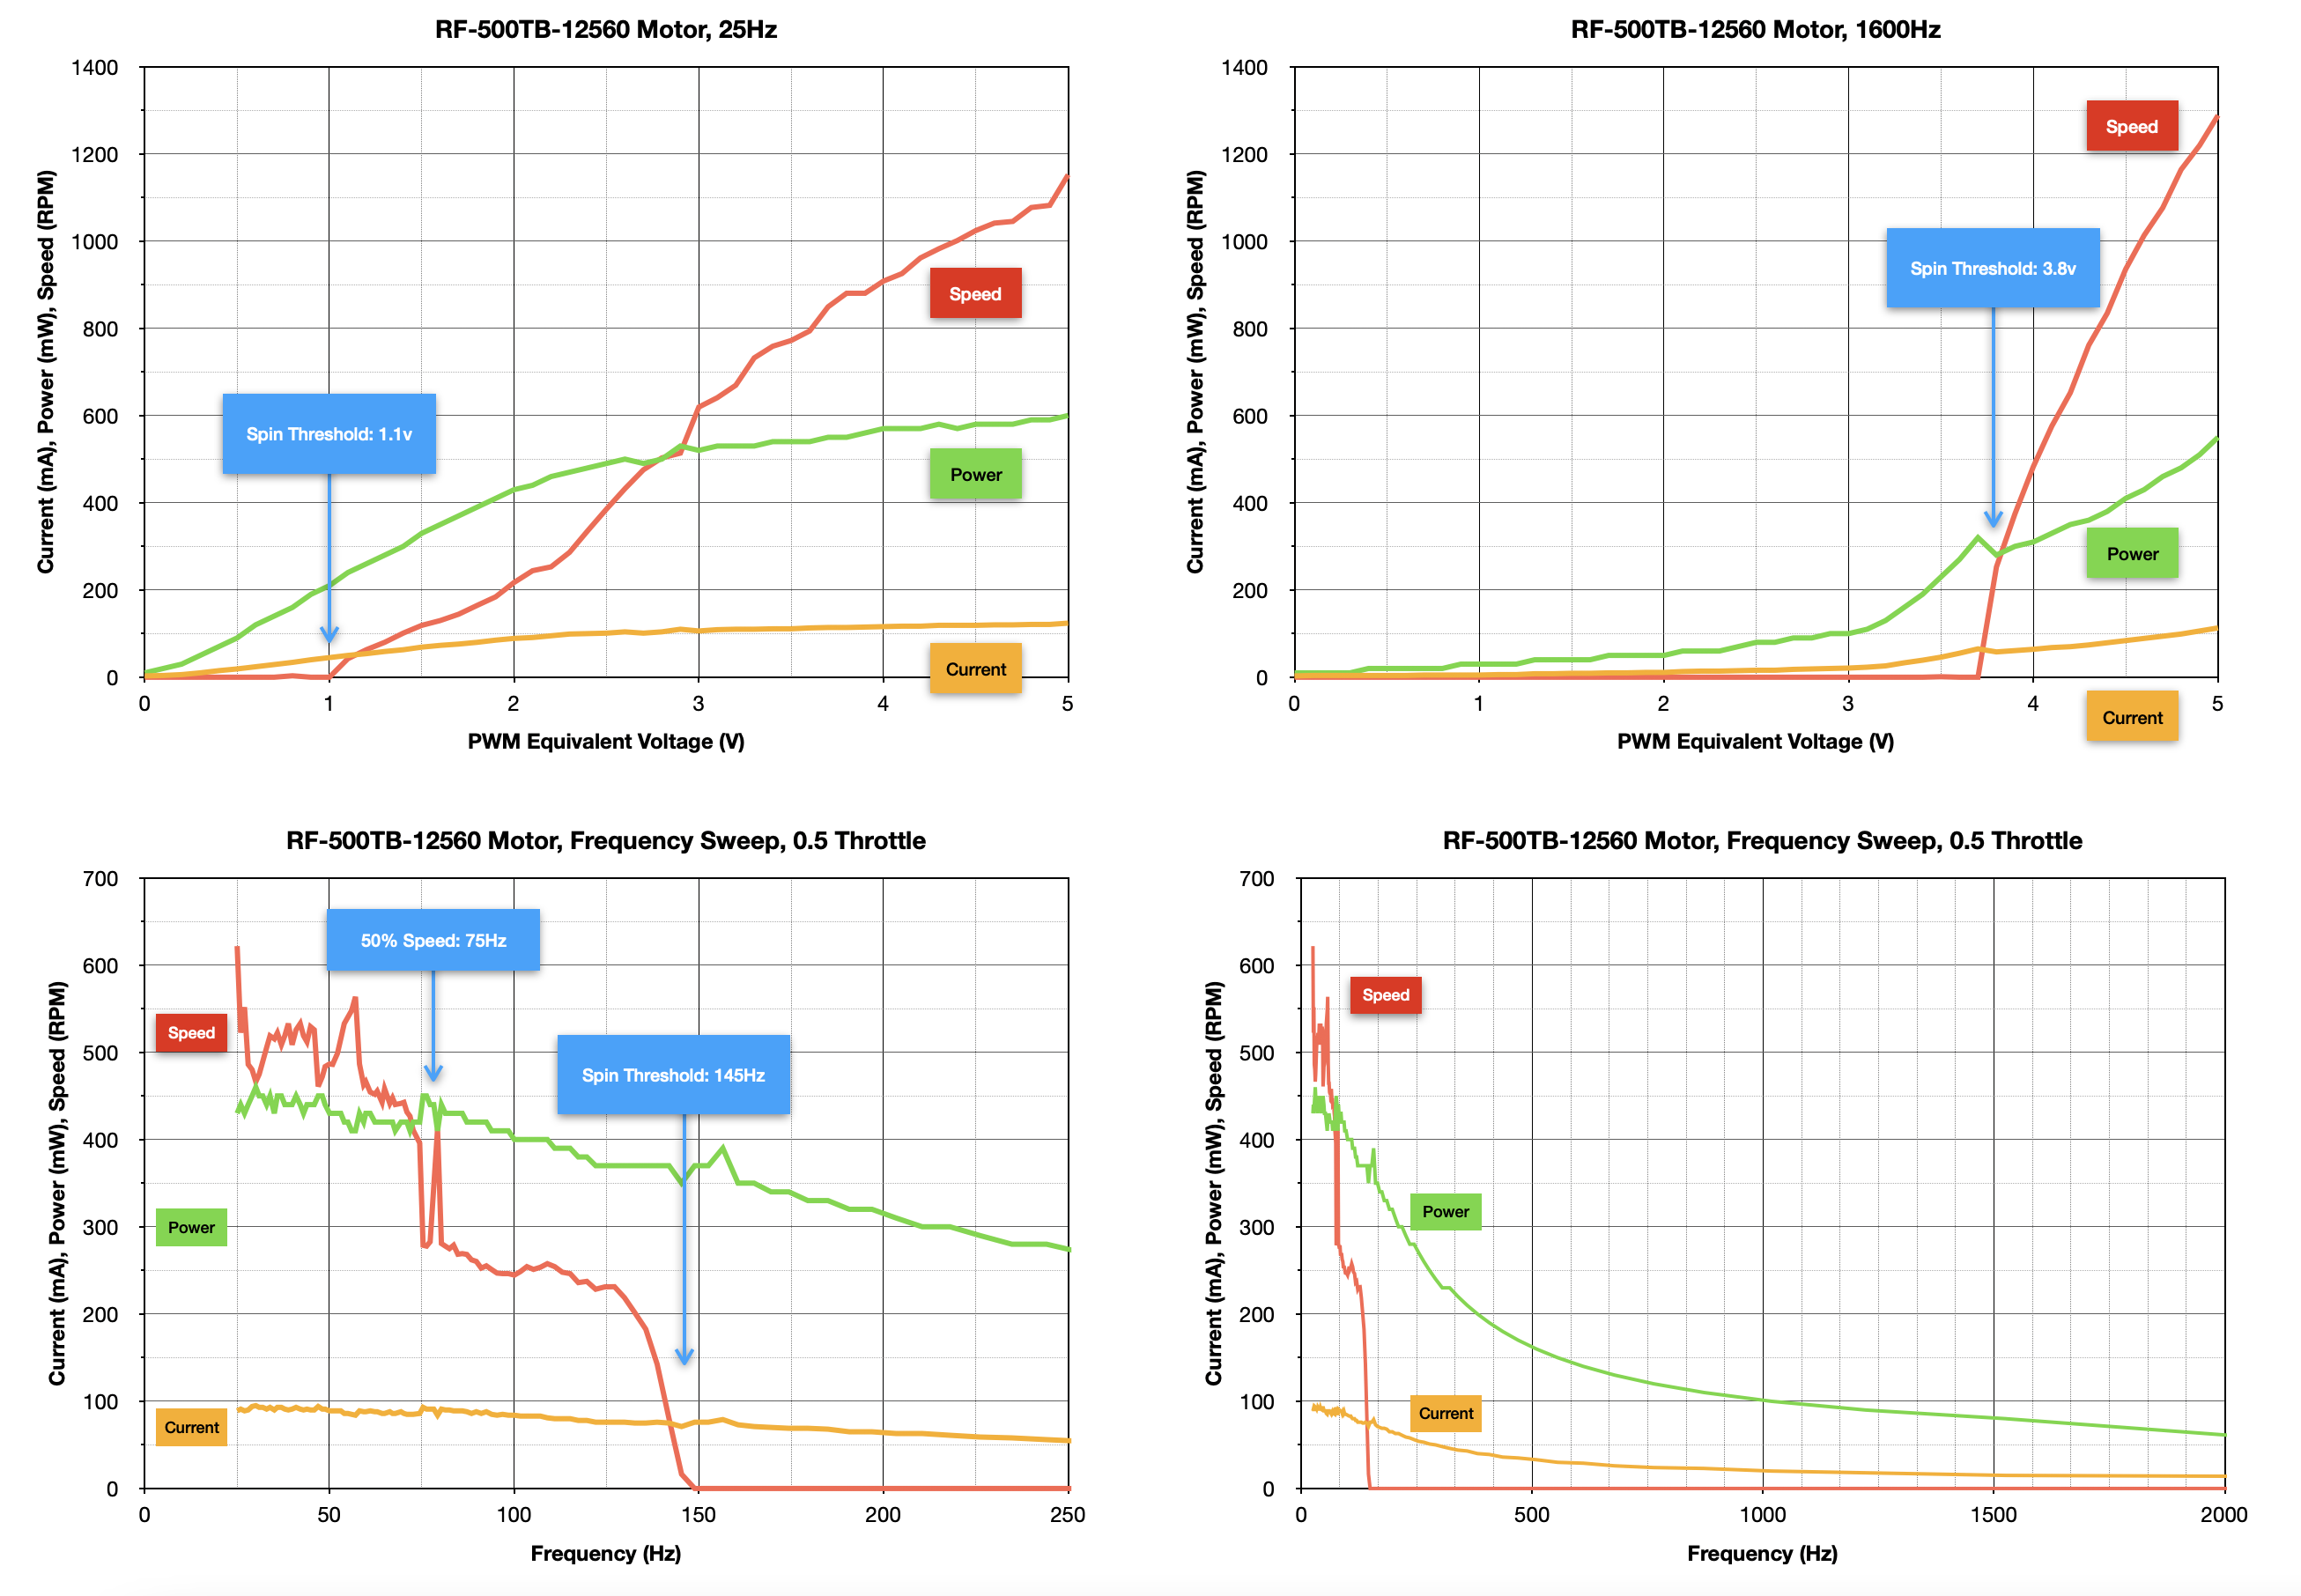 robotics___cnc_RF-500TB-12560_Motor_Summary_Graphs.png